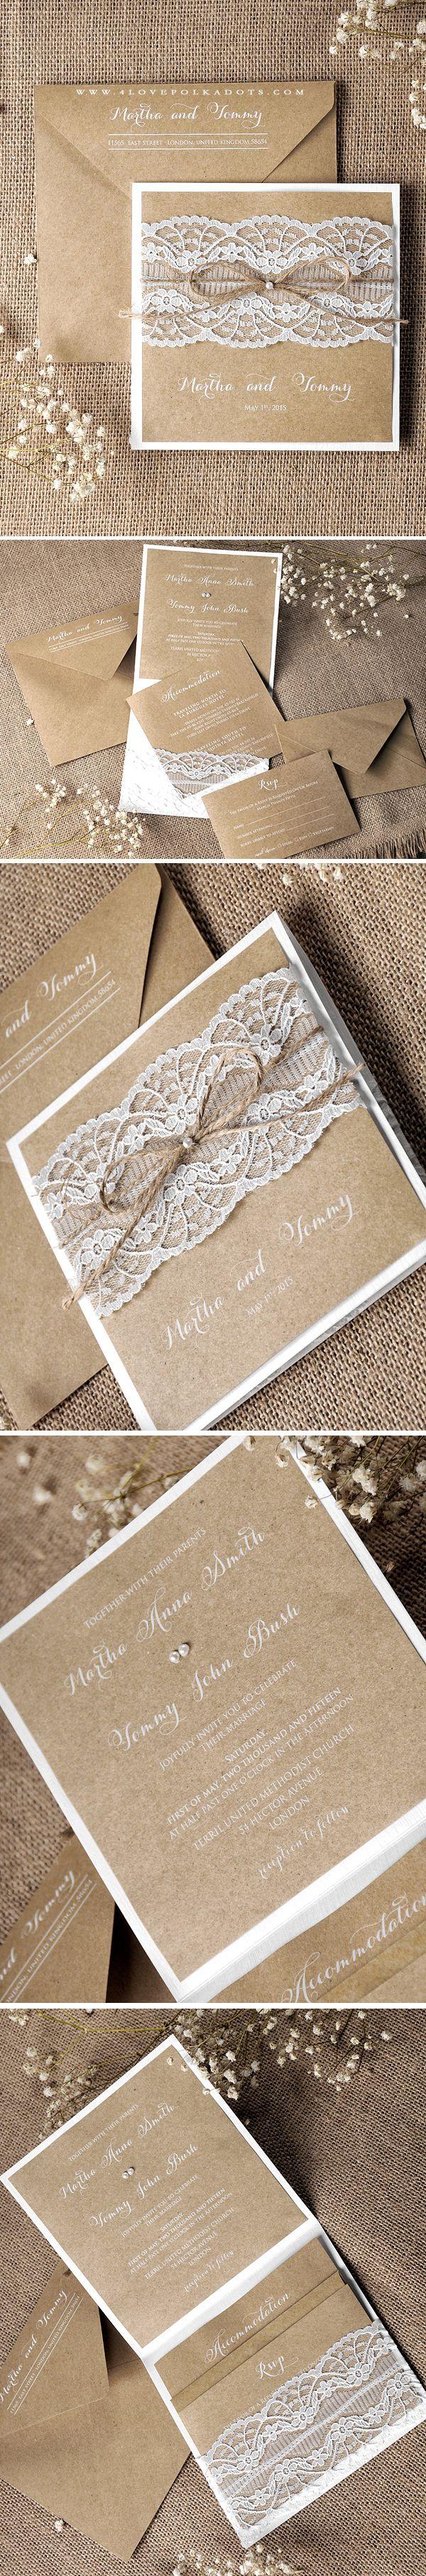 Lace wedding invitation eco papers u white printing